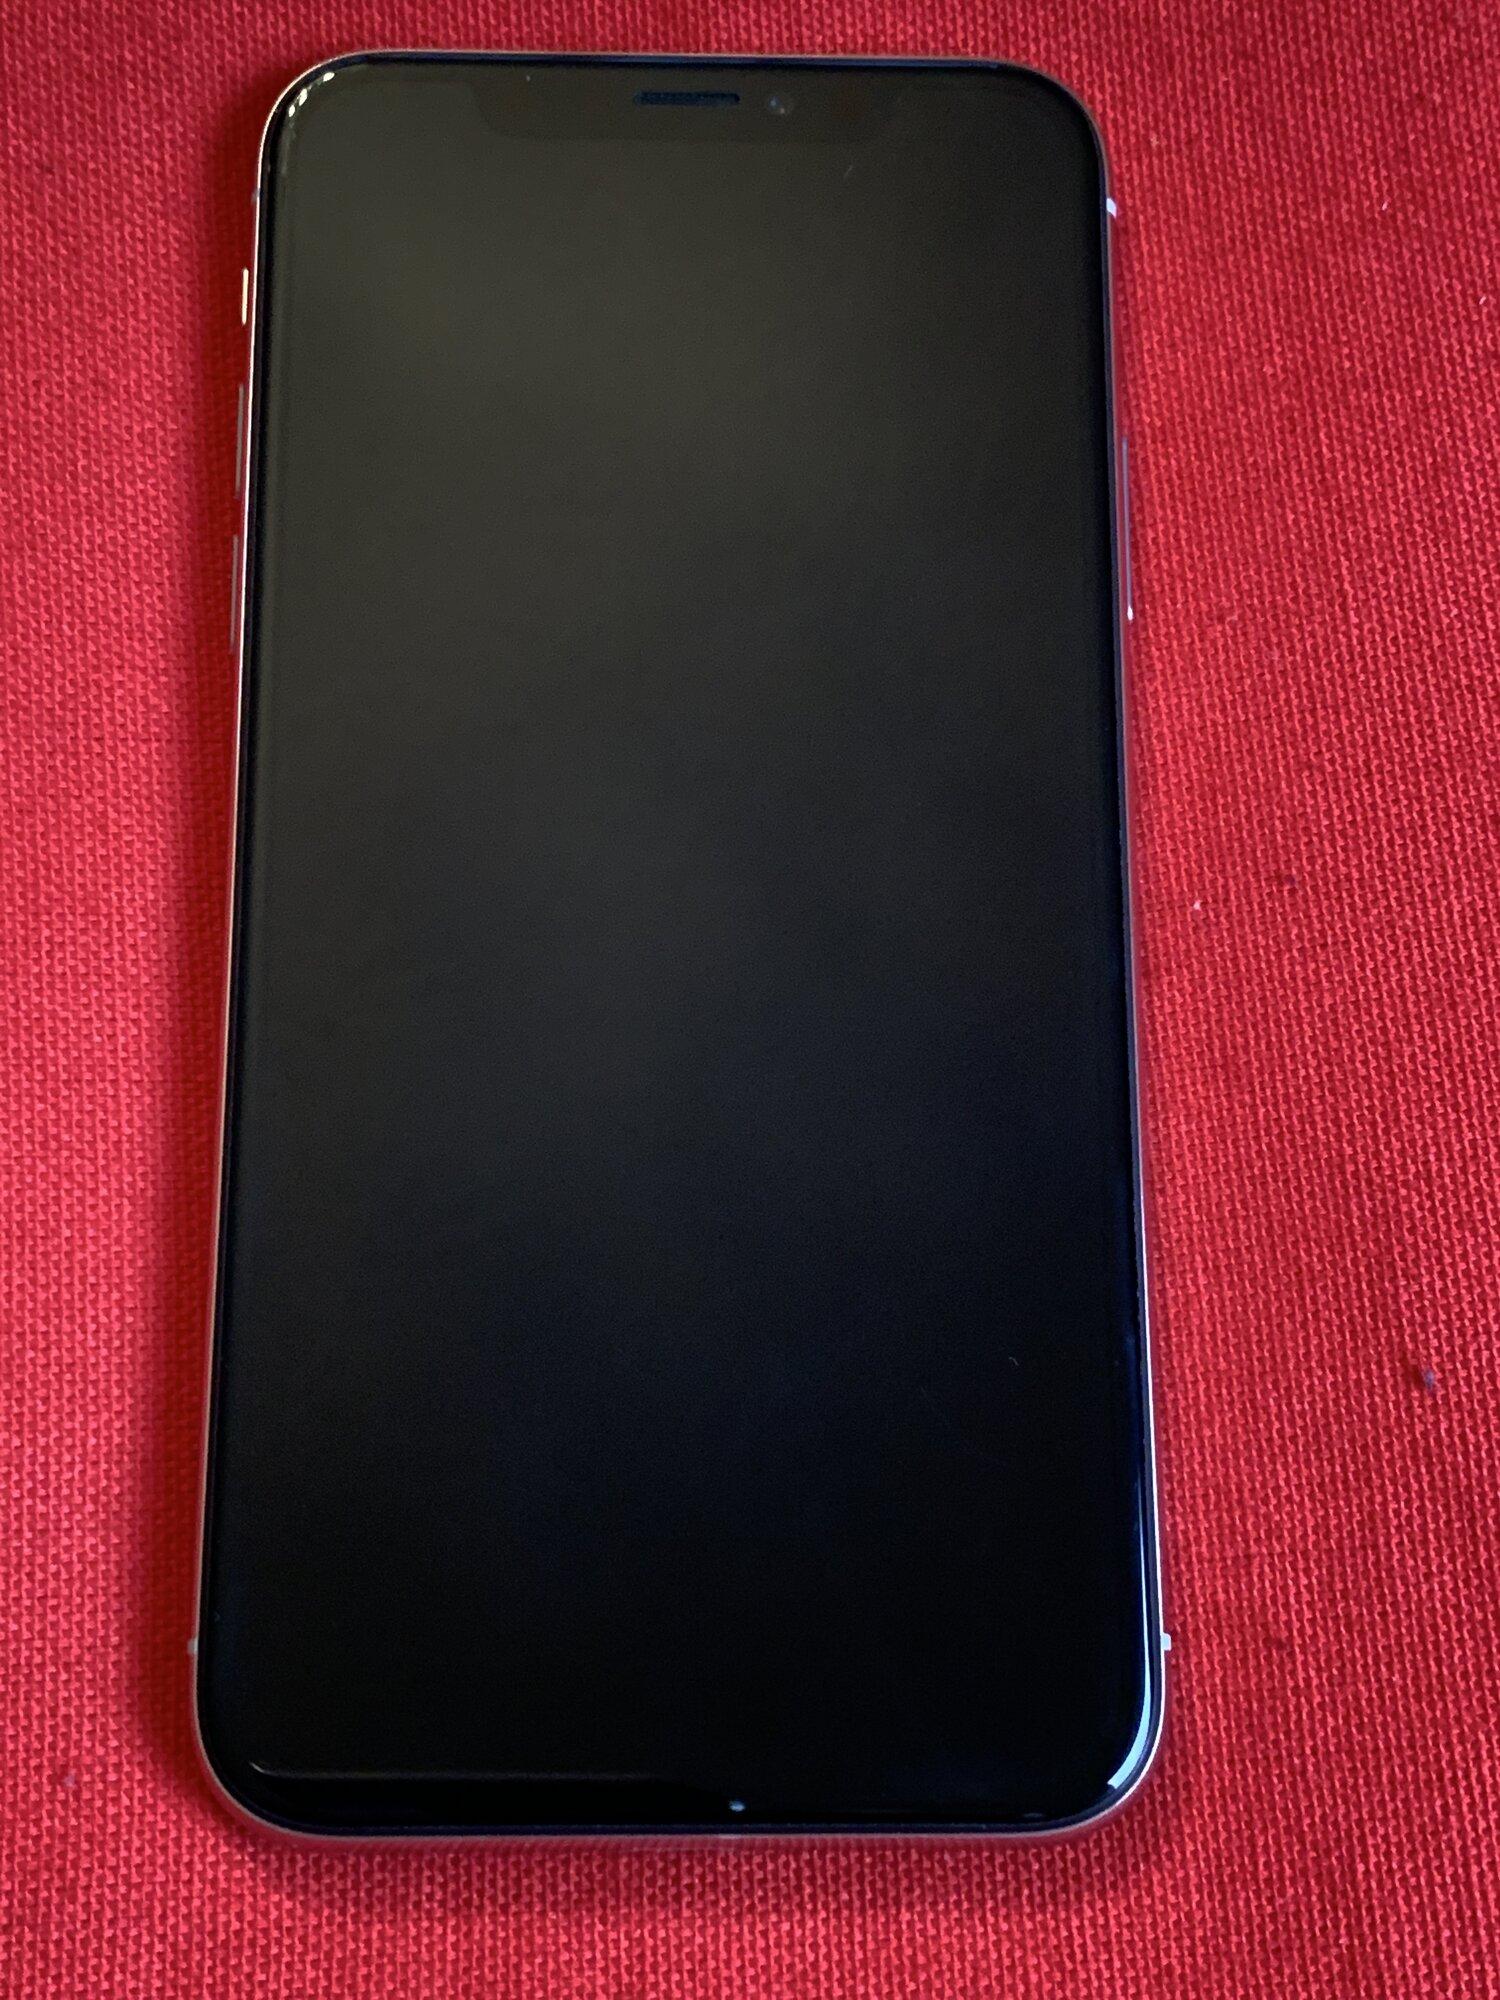 iPhone X (4).JPG